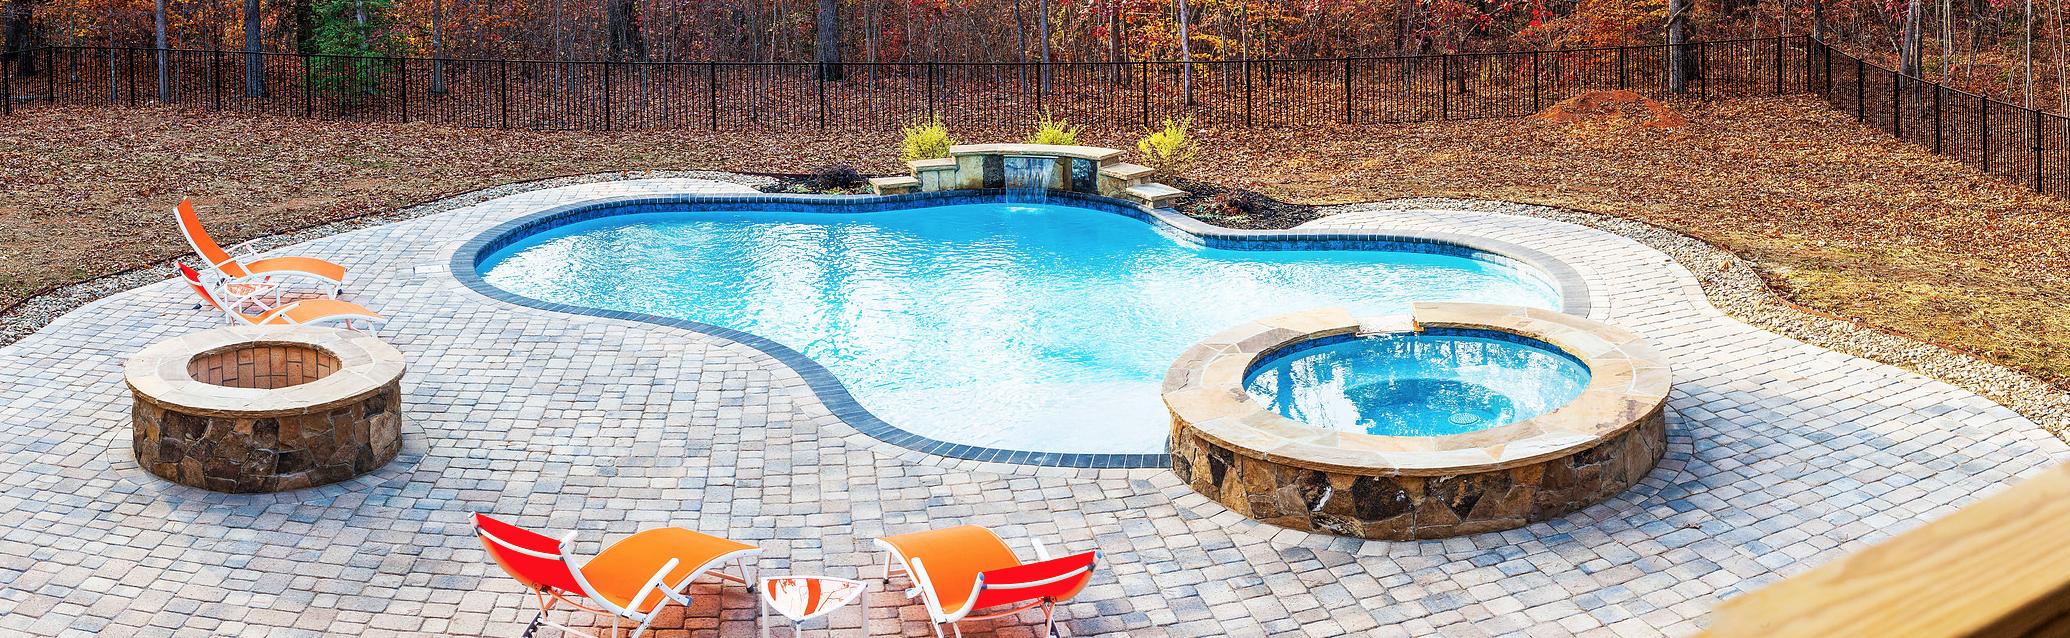 Iron Station NC Inground Custom Luxury Concrete Swimming Pools - CPC Pools 704-799-5236